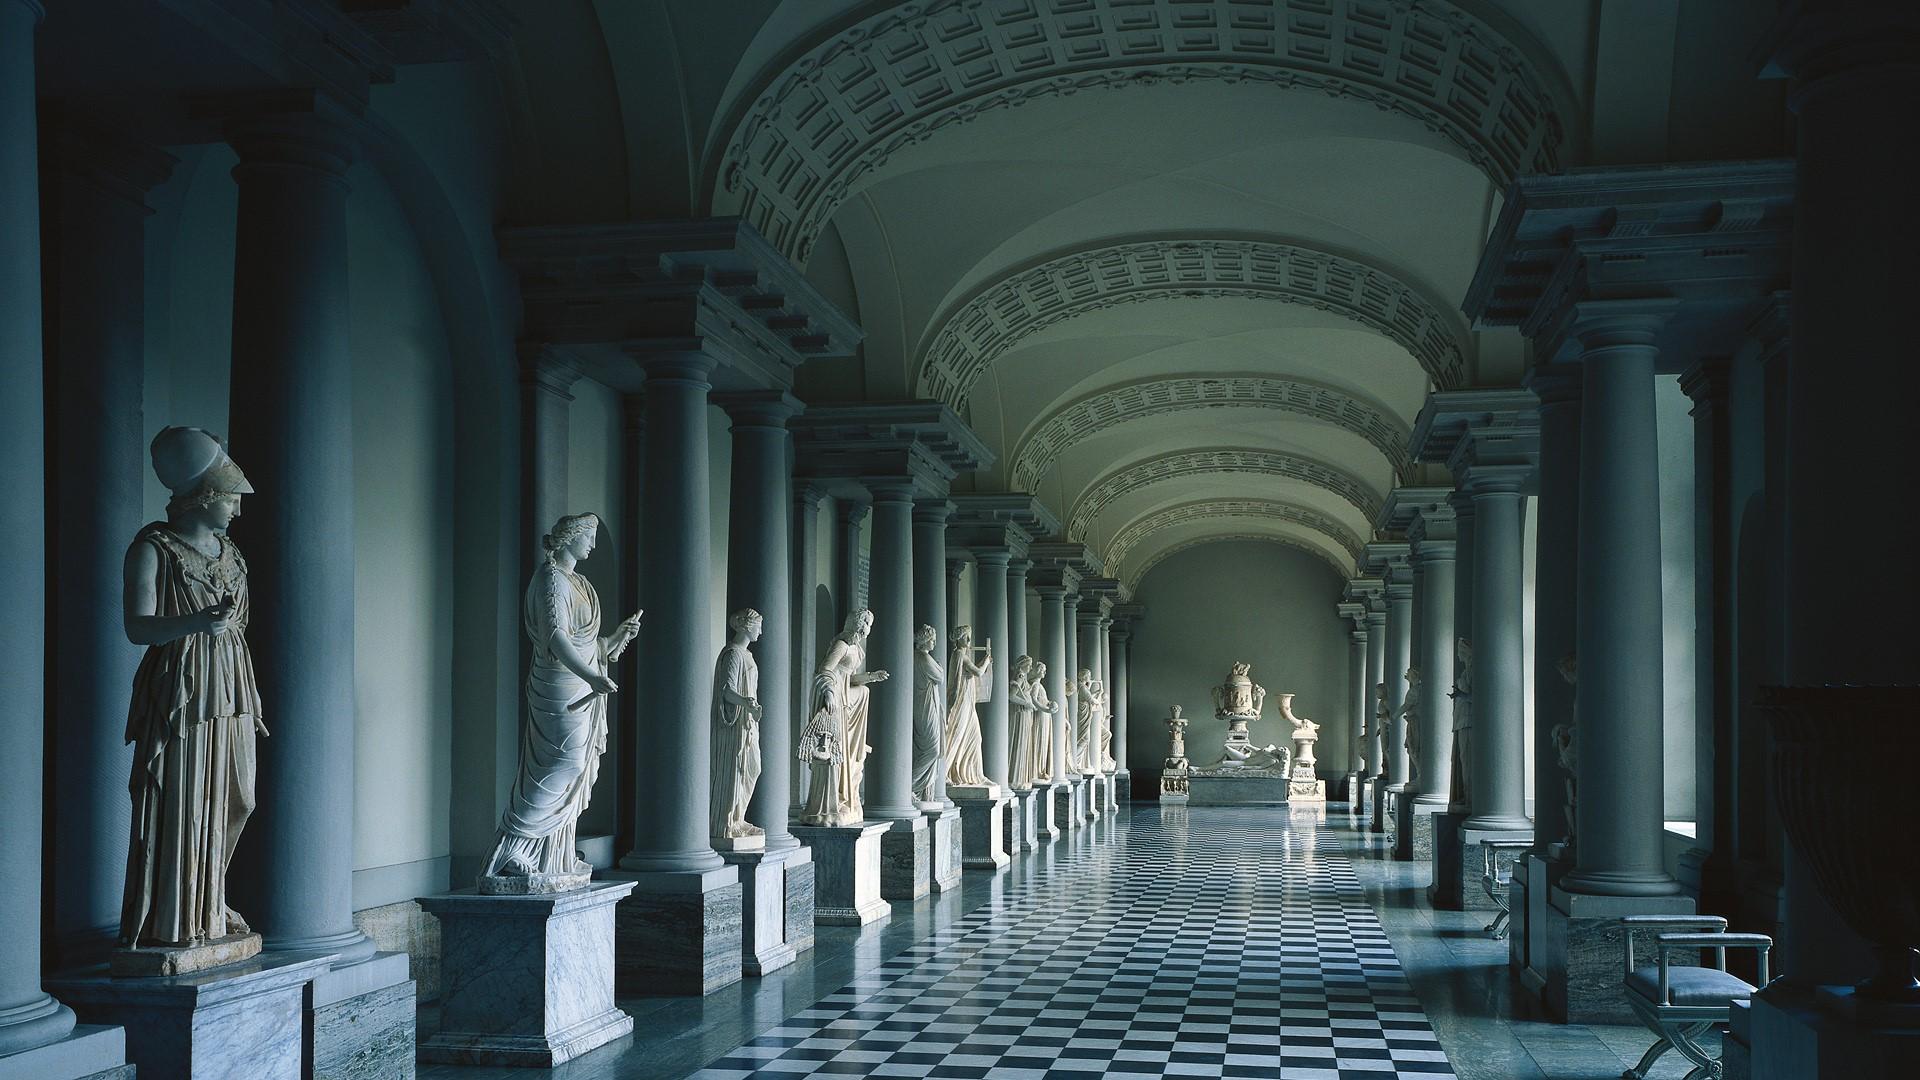 Colonnade in gustav iiis museum of antiquities in stockholm palace sweden